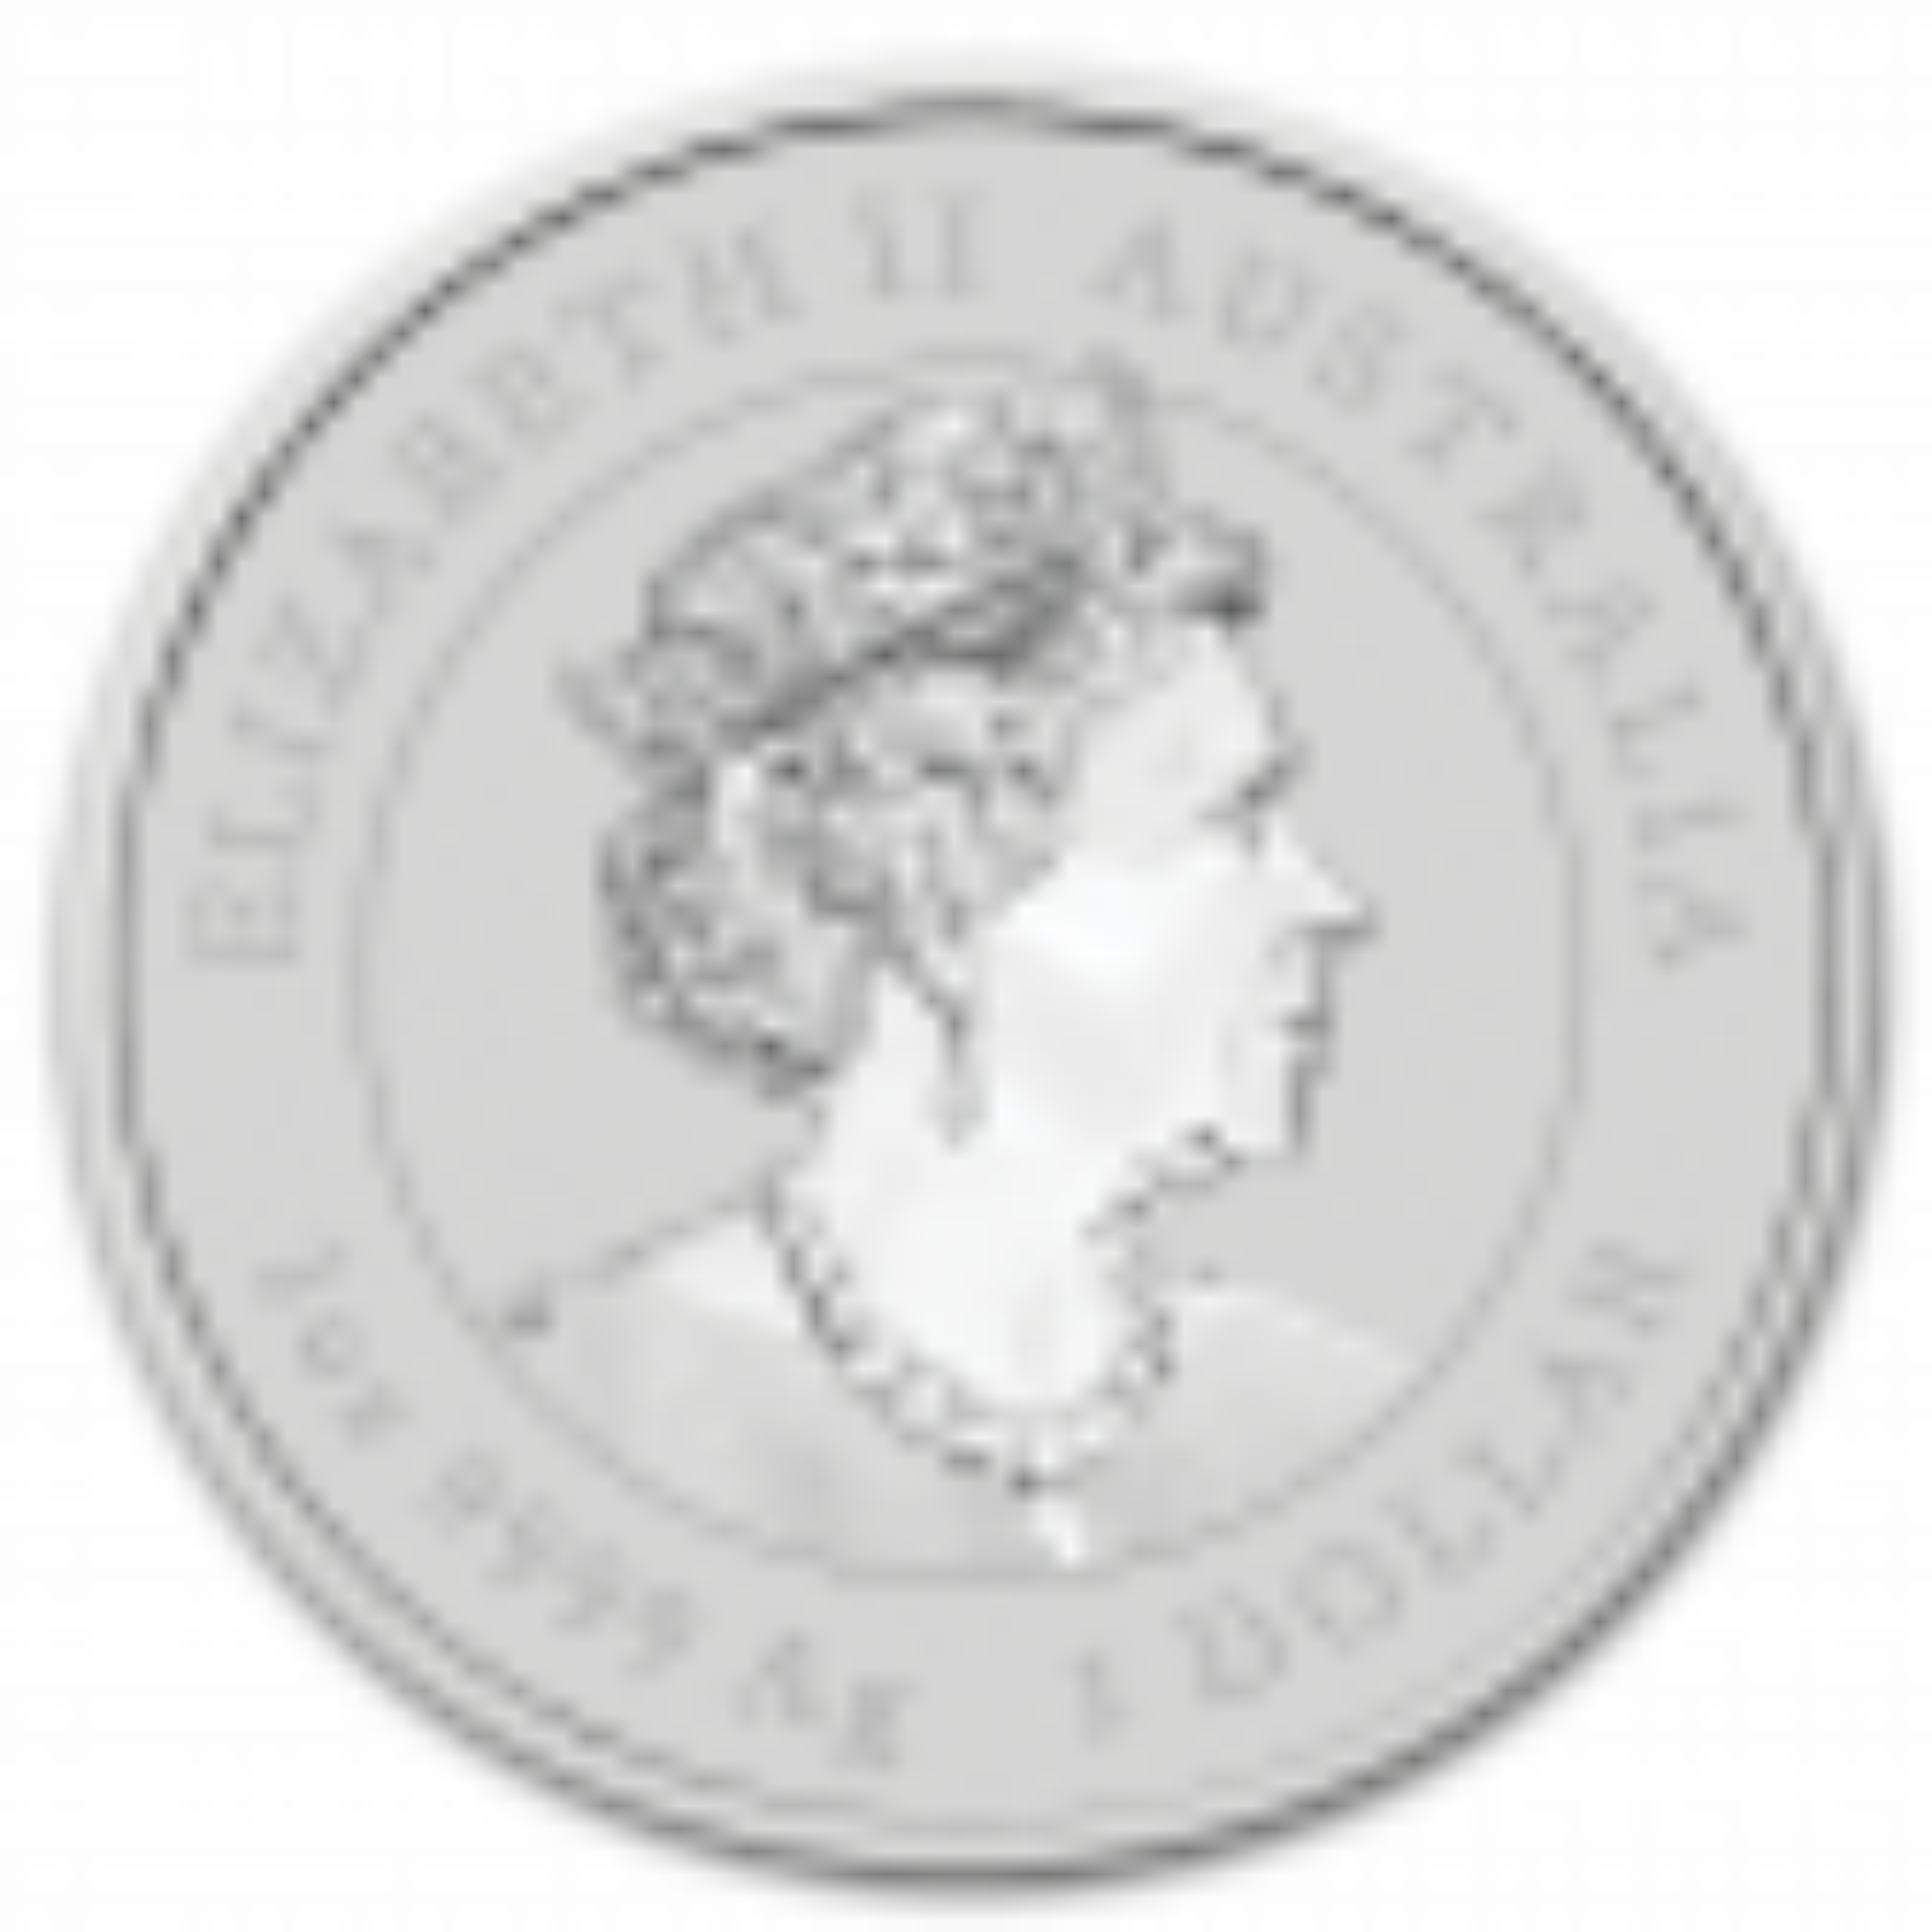 1 Troy ounce silver coin Lunar 2020 reverse